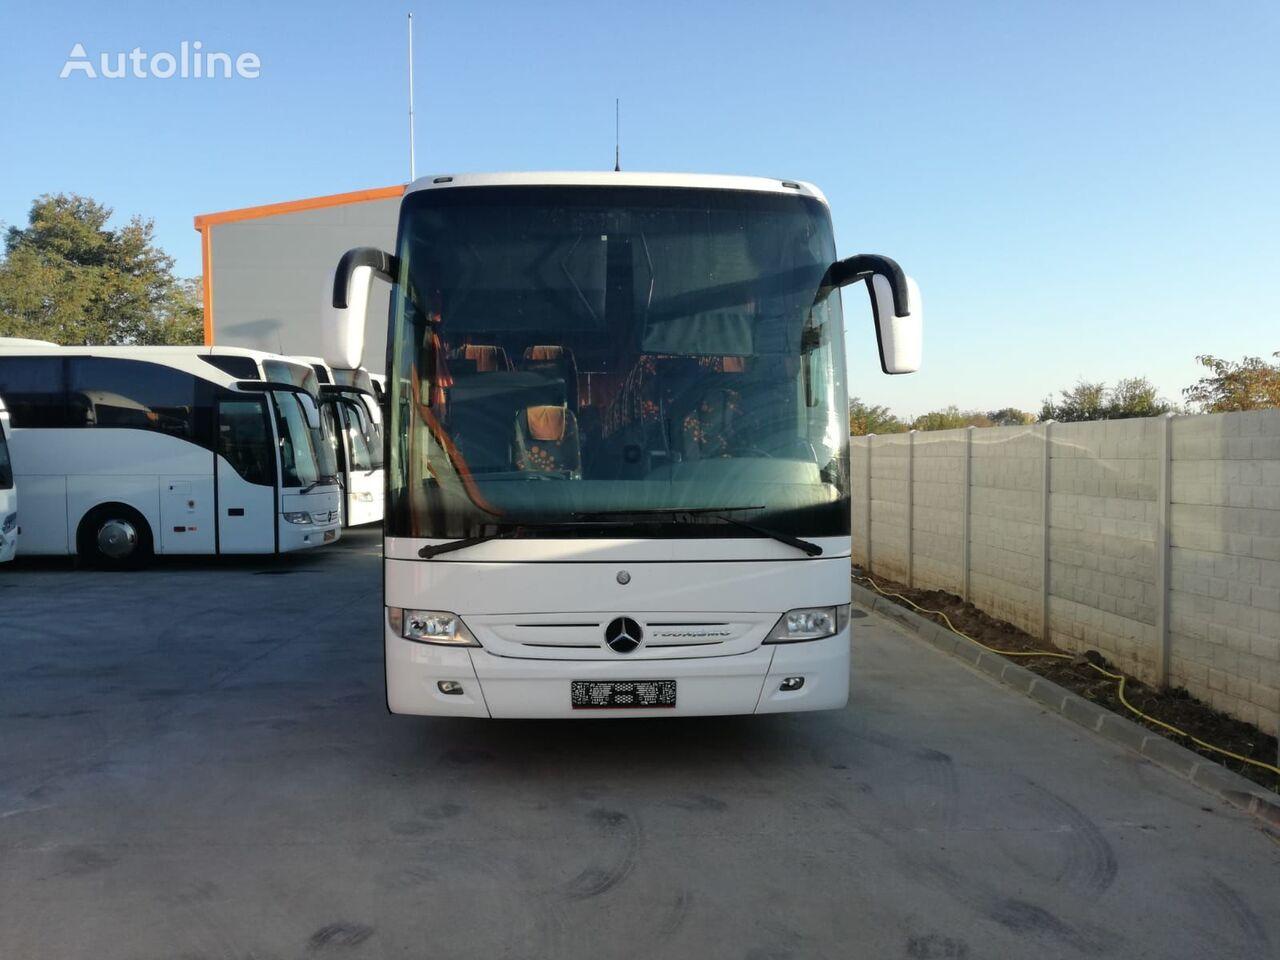 MERCEDES-BENZ Tourismo 15 RHD coach bus